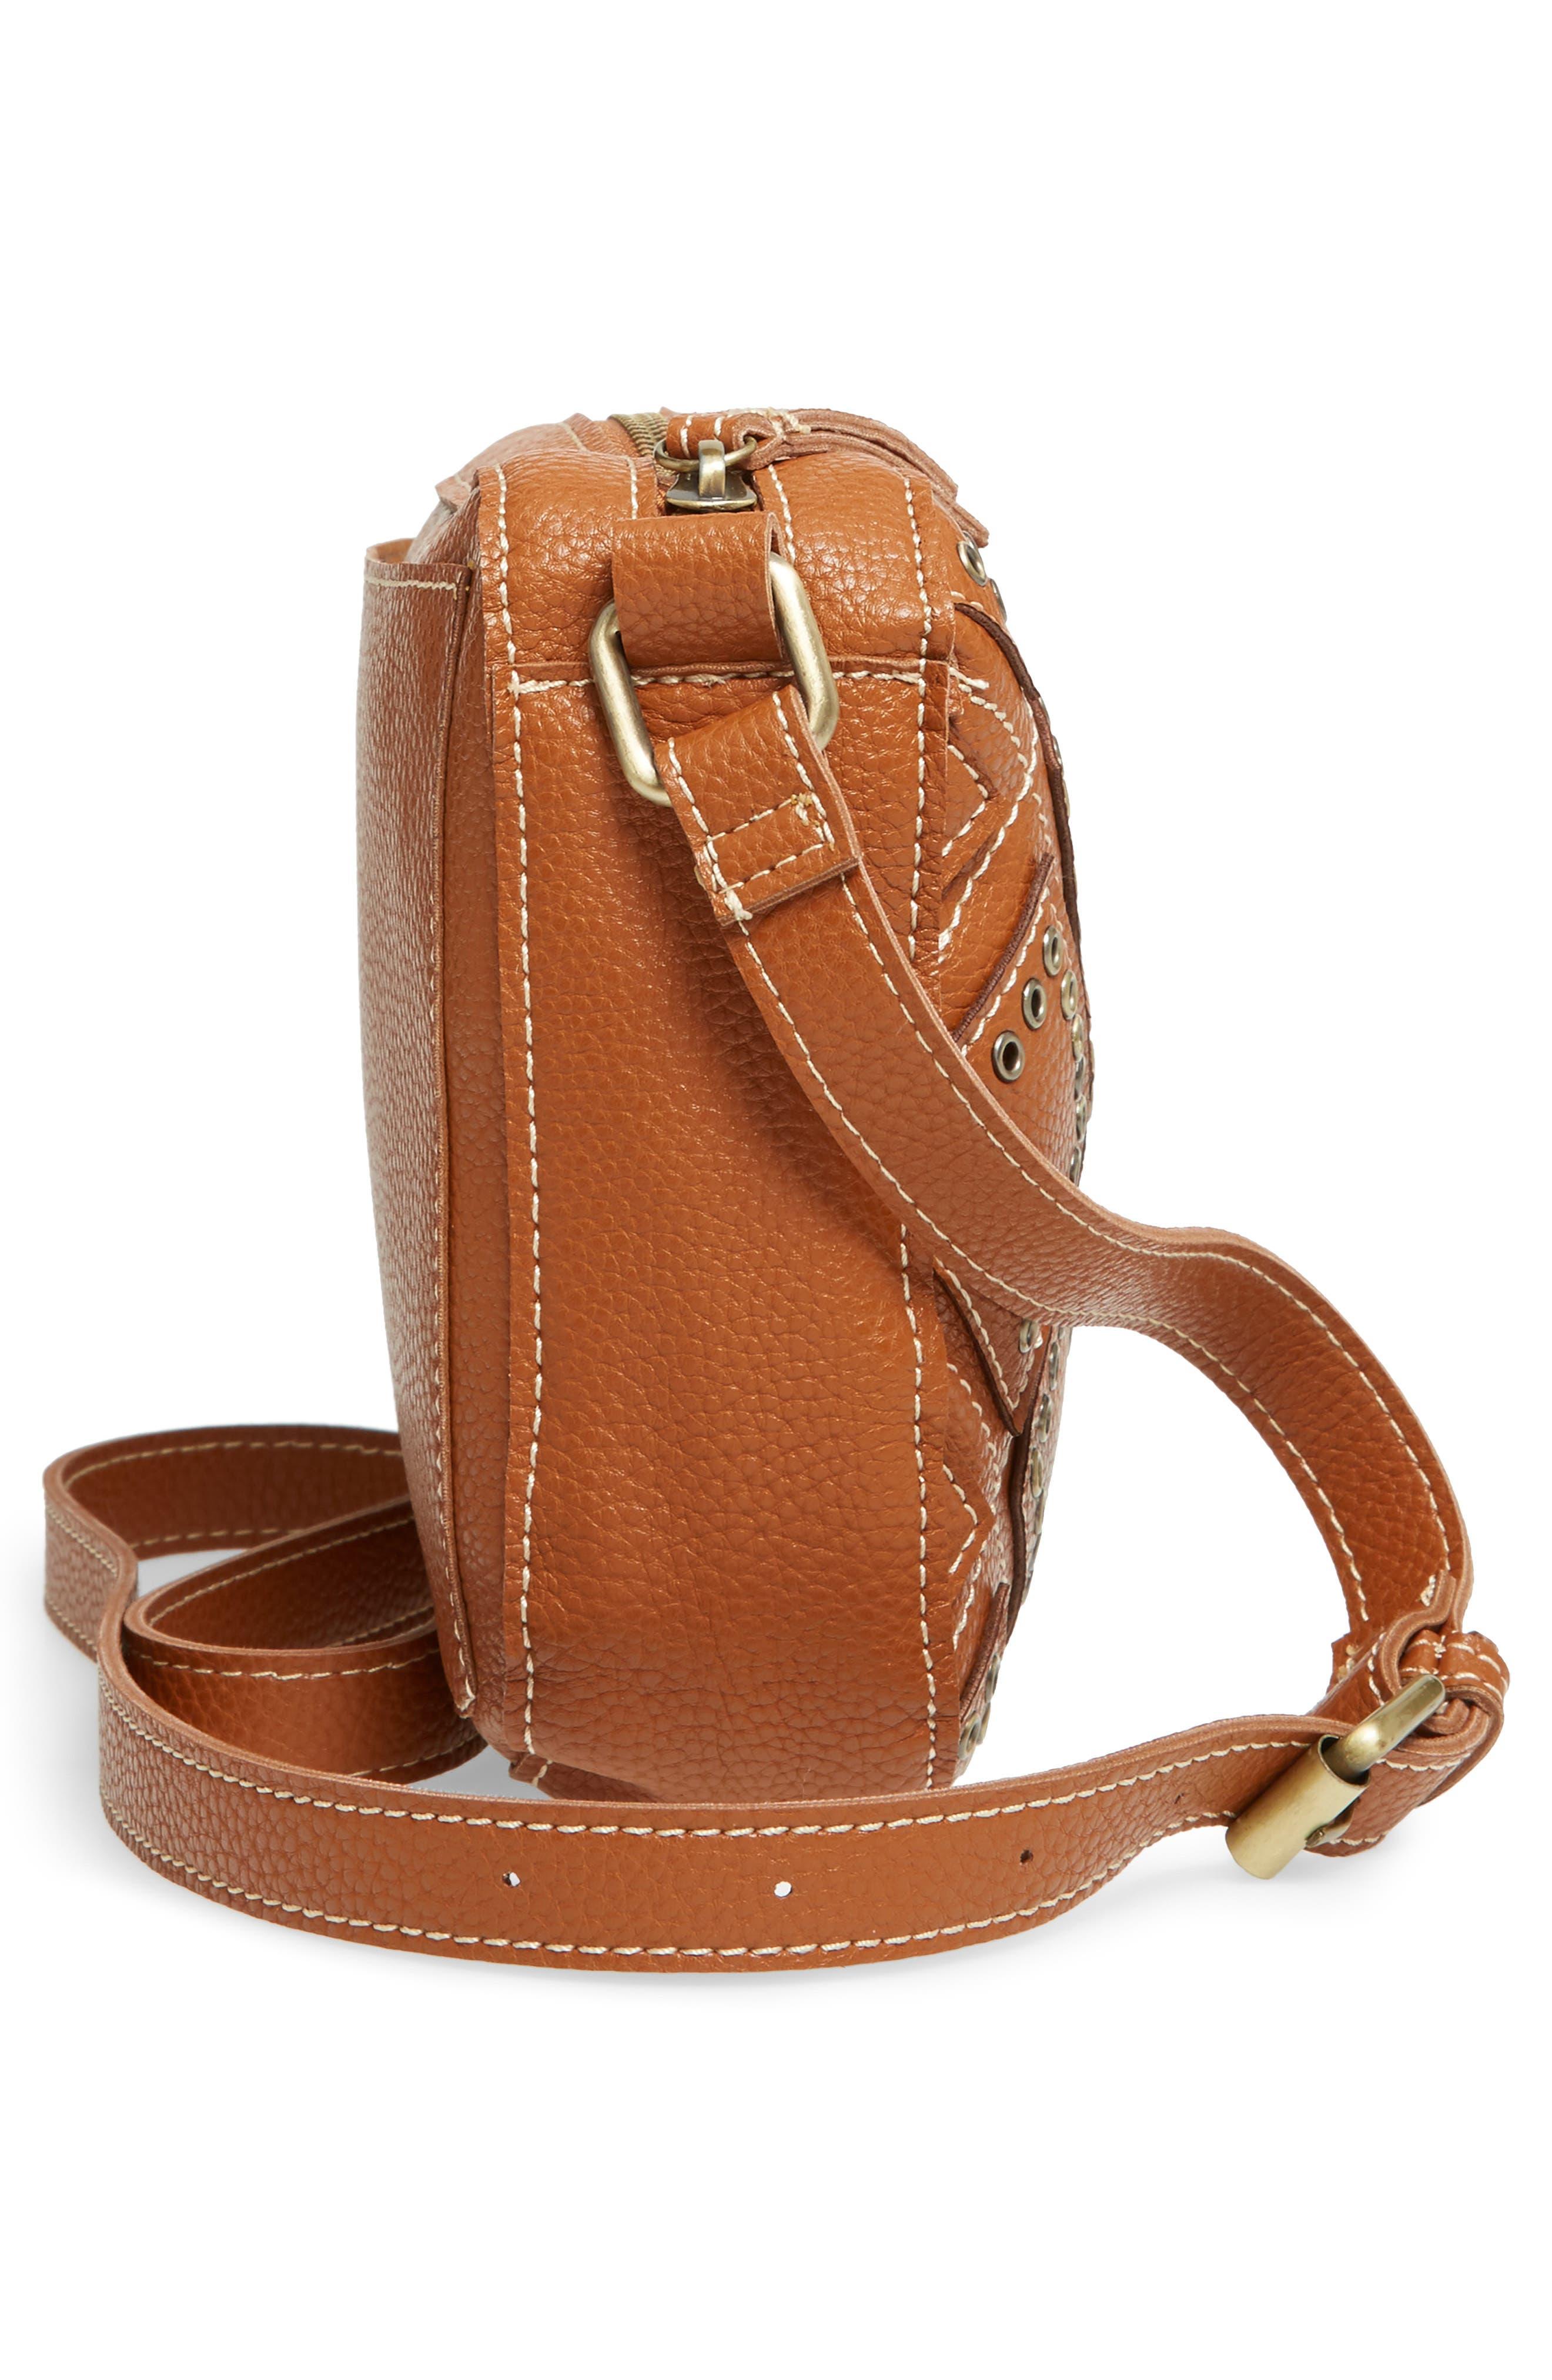 Skylar Faux Leather Crossbody Bag,                             Alternate thumbnail 5, color,                             211